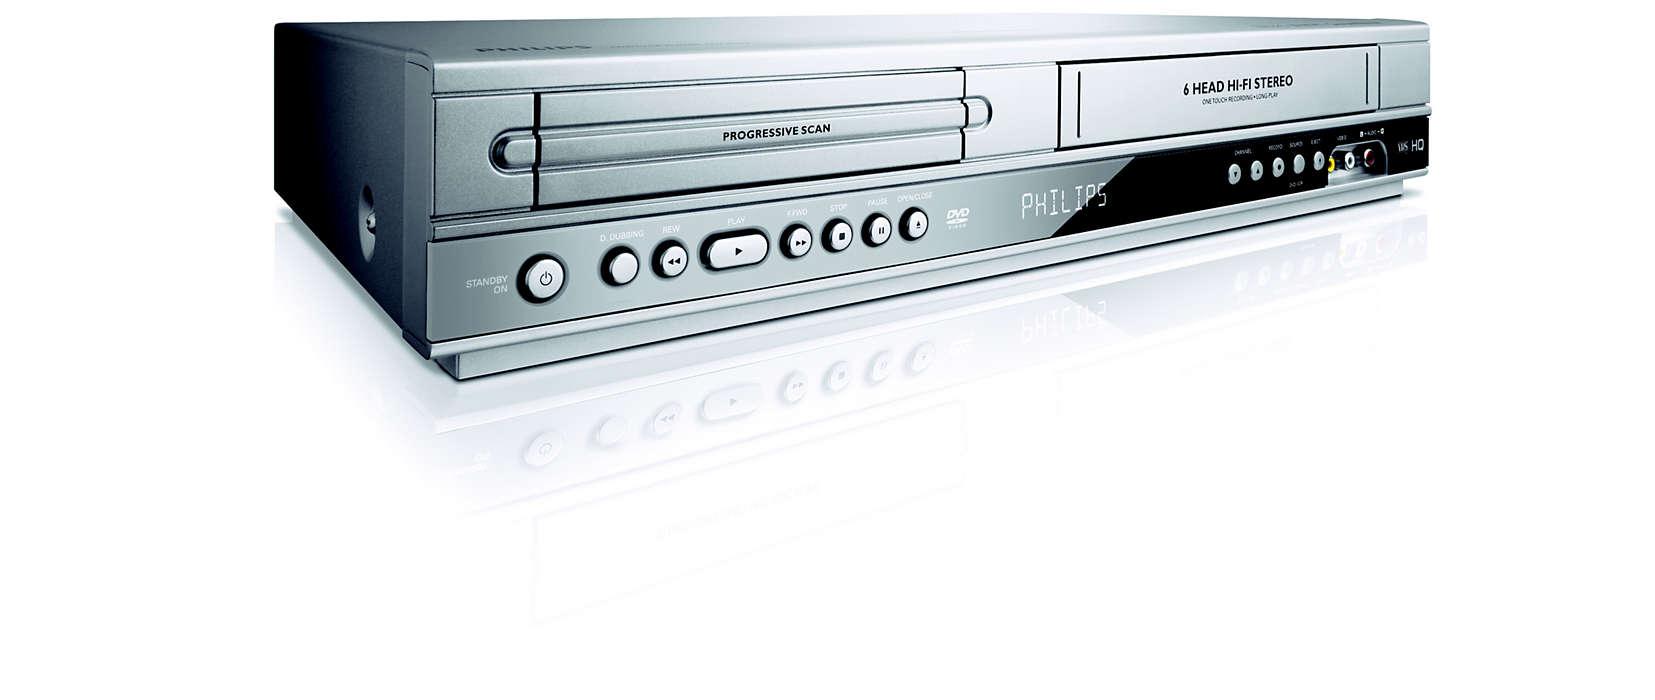 DVD/VCR Player DVP3350V/05 | Philips